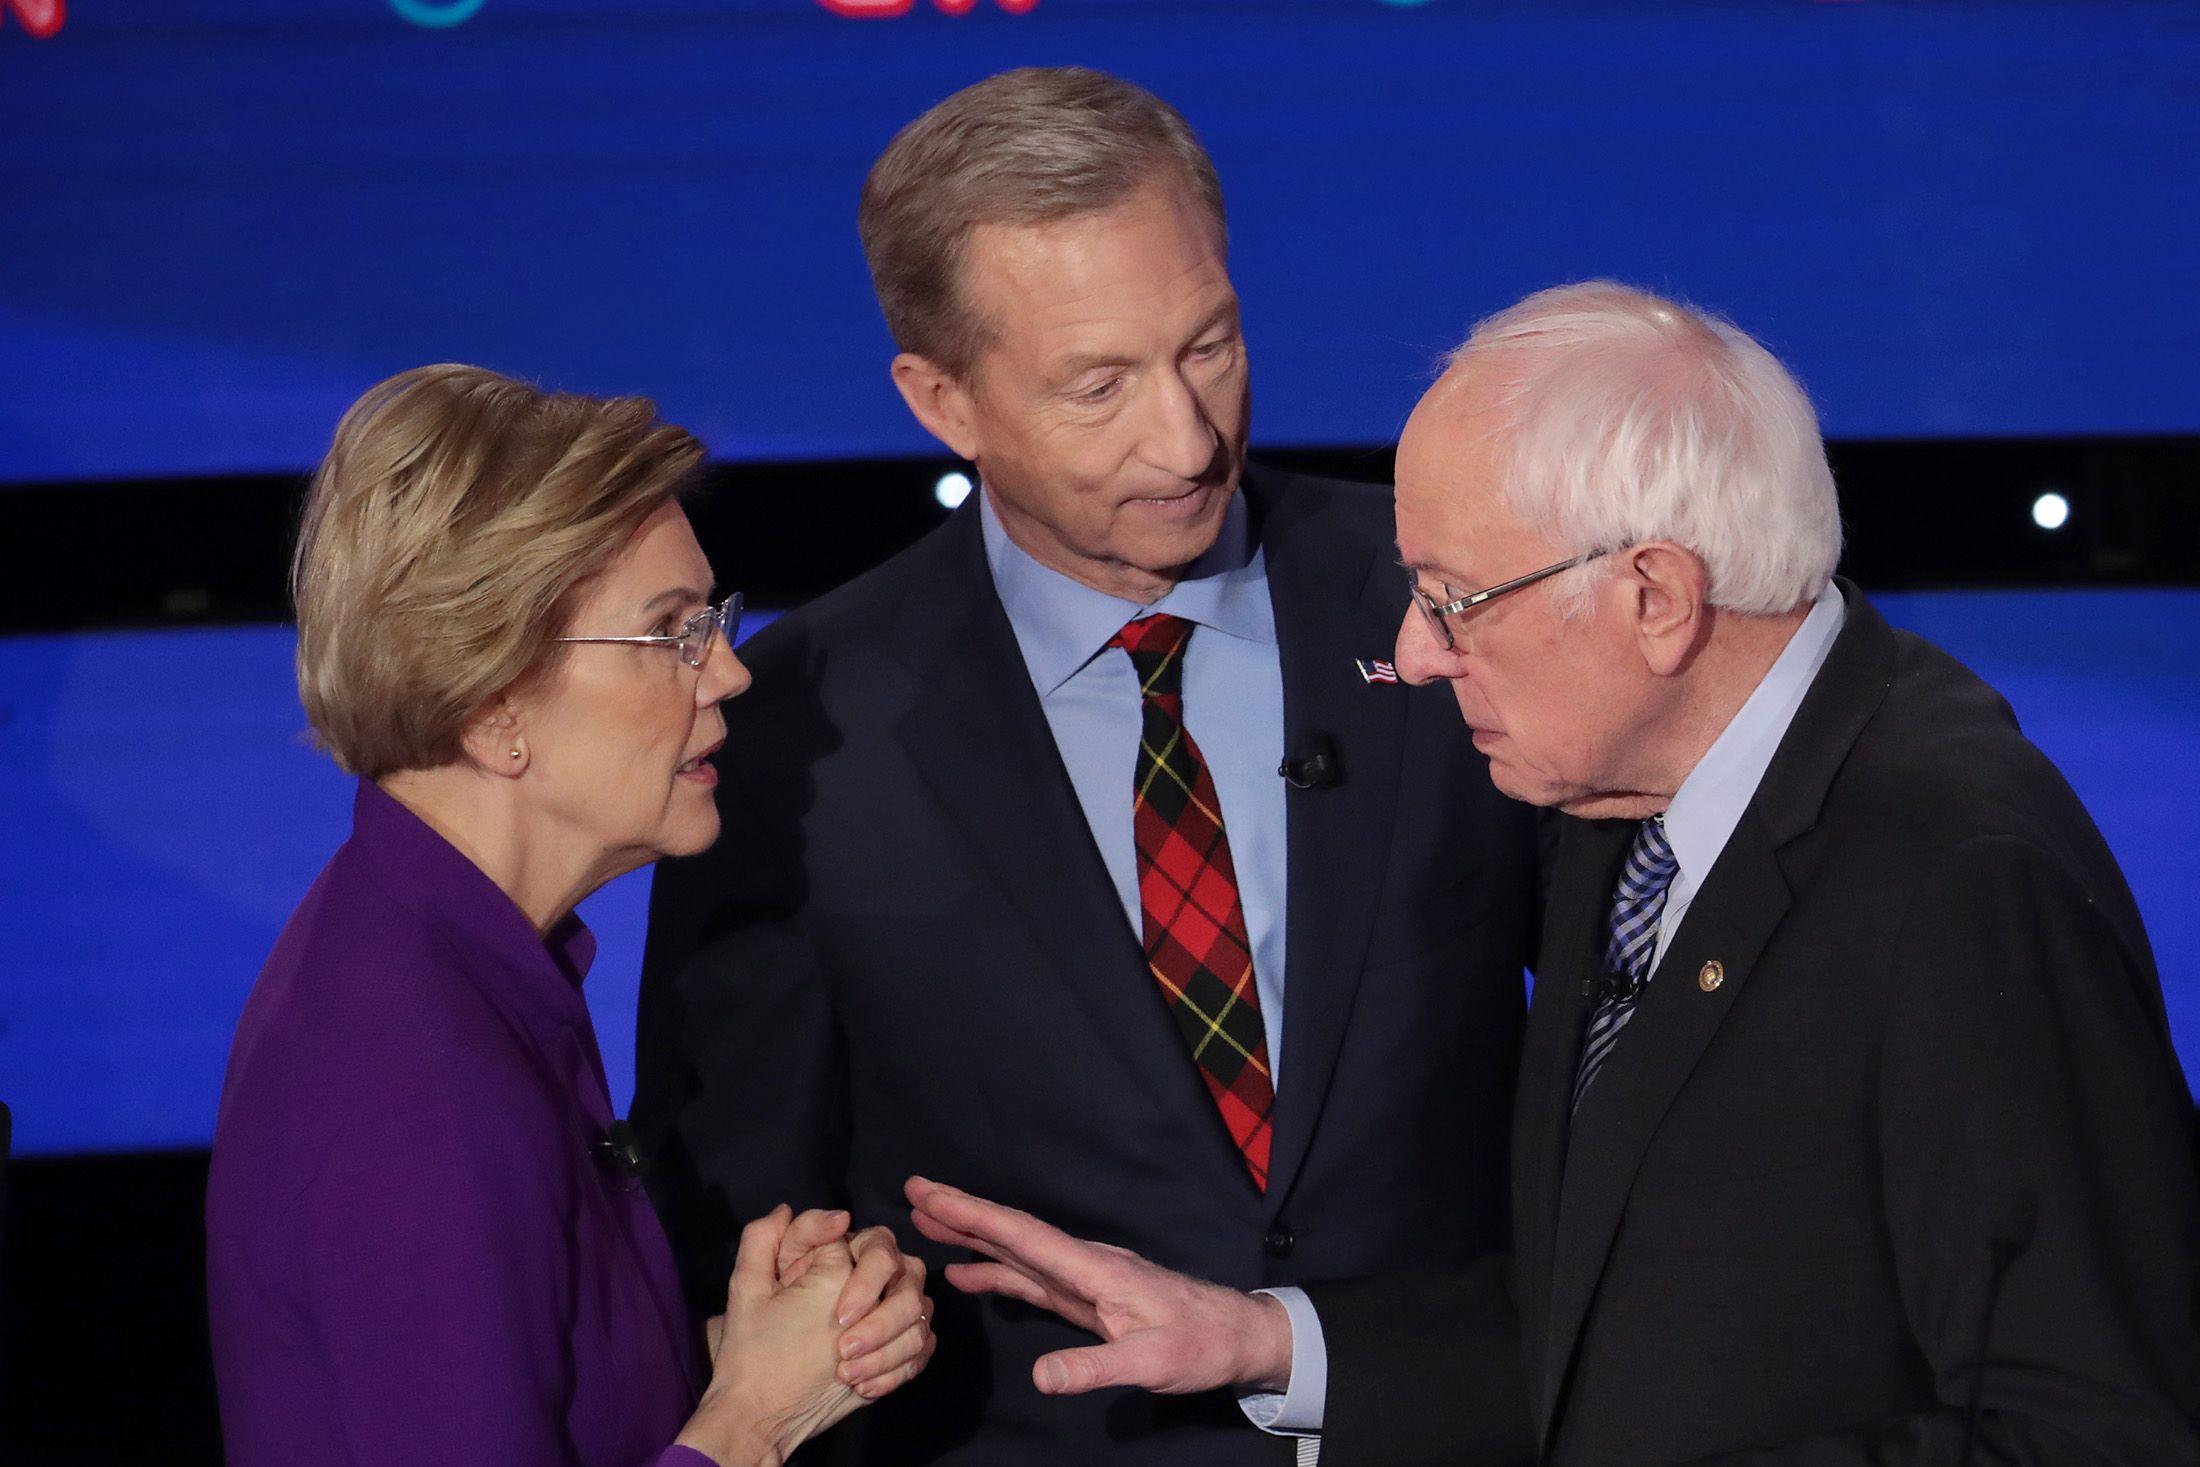 Sanders-Warren Clash on Women Elevates Acrimony in Iowa Debate